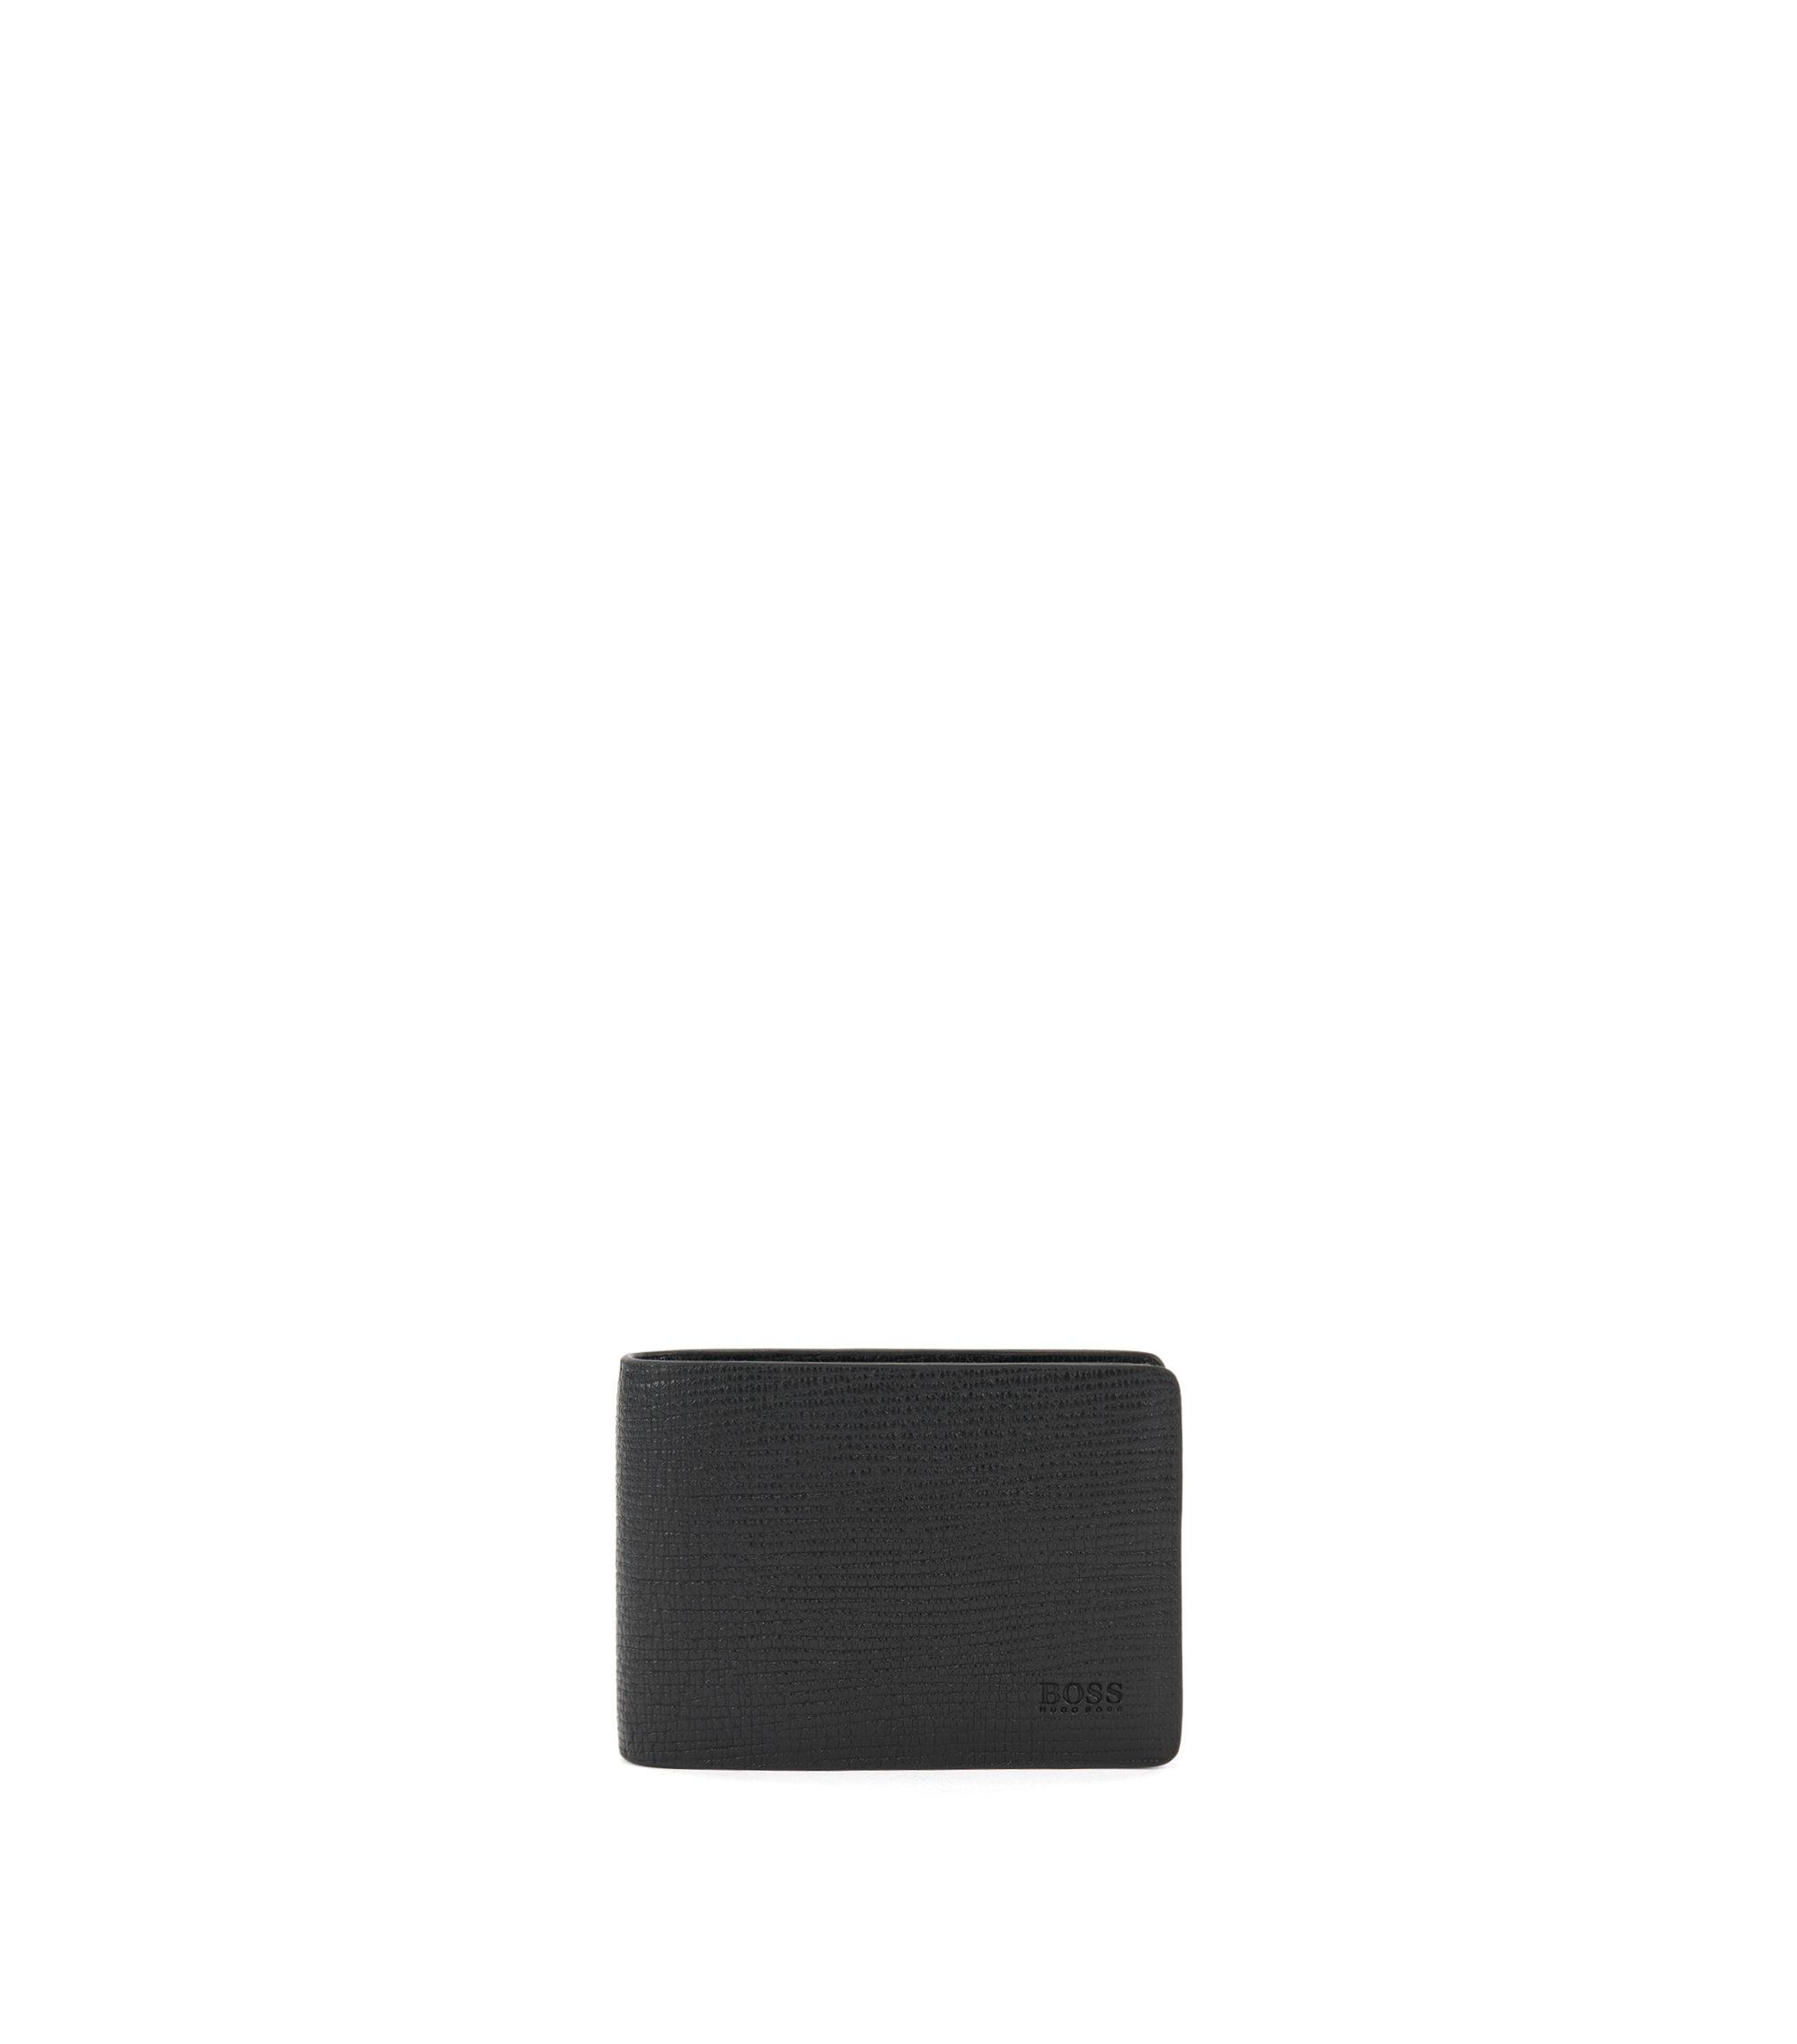 Leather Billfold Wallet | Timeless 6 CC Flap, Black